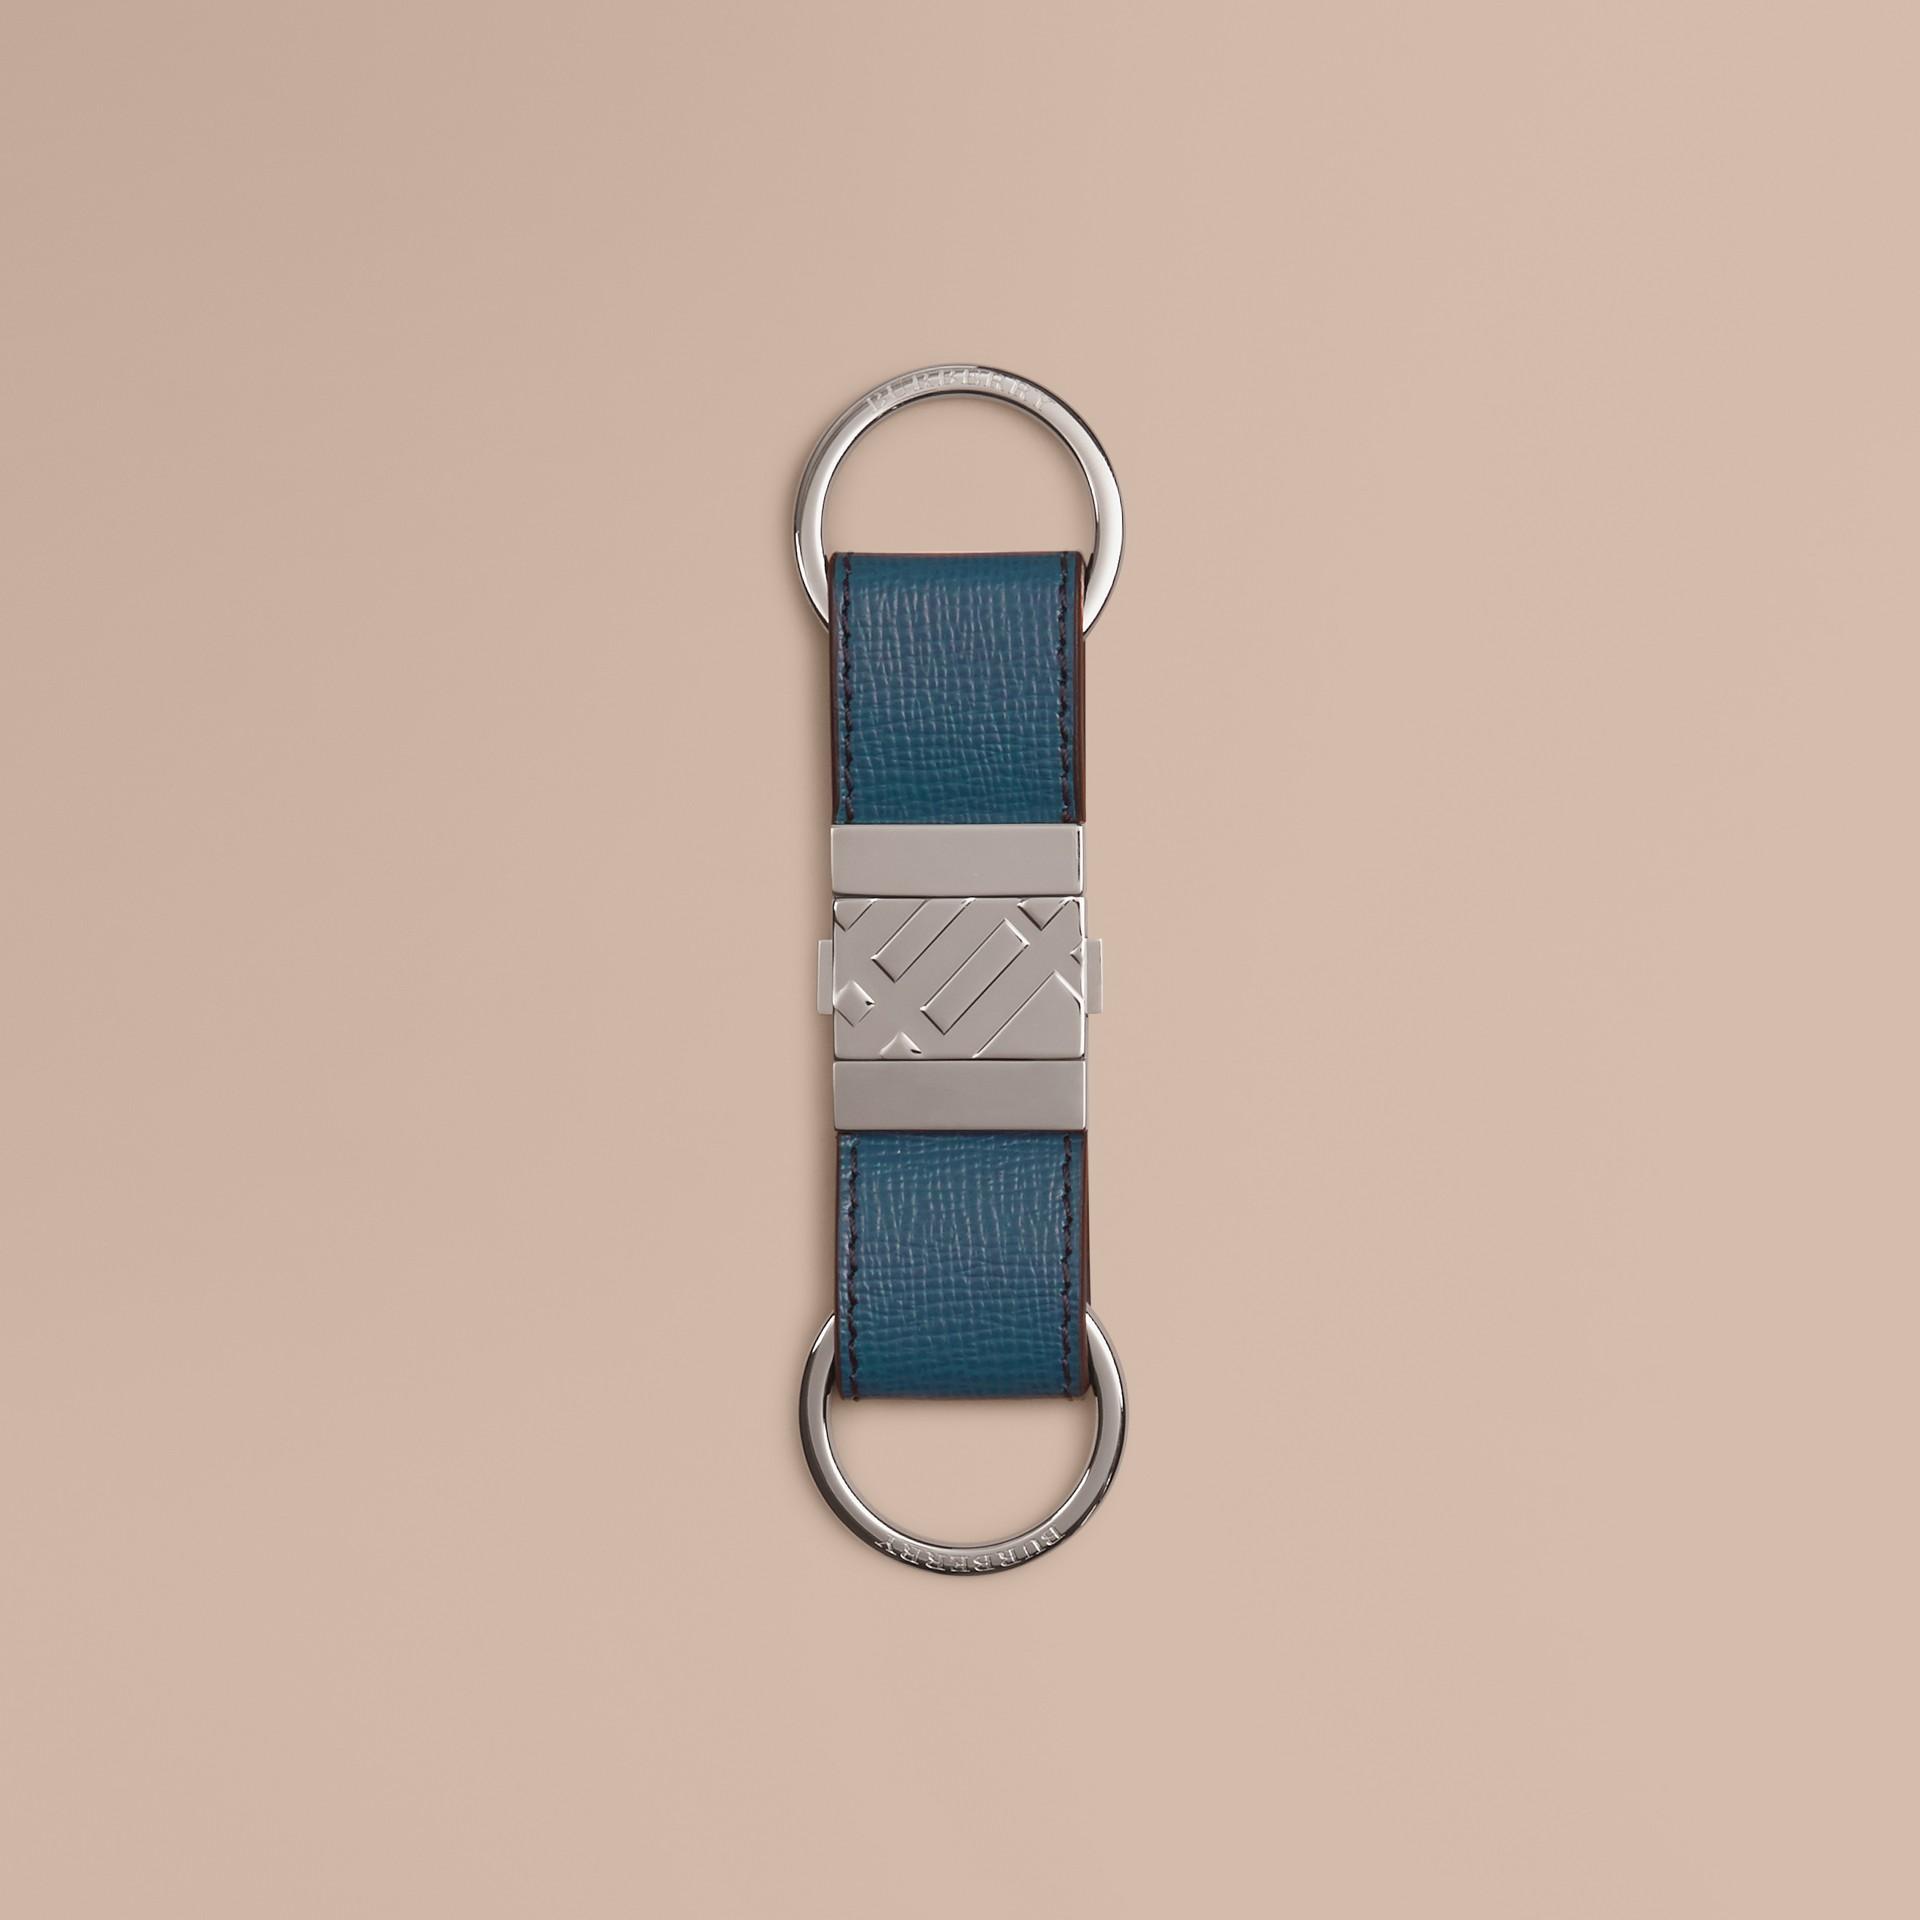 Bleu minéral Porte-clés Valet en cuir London Bleu Minéral - photo de la galerie 1